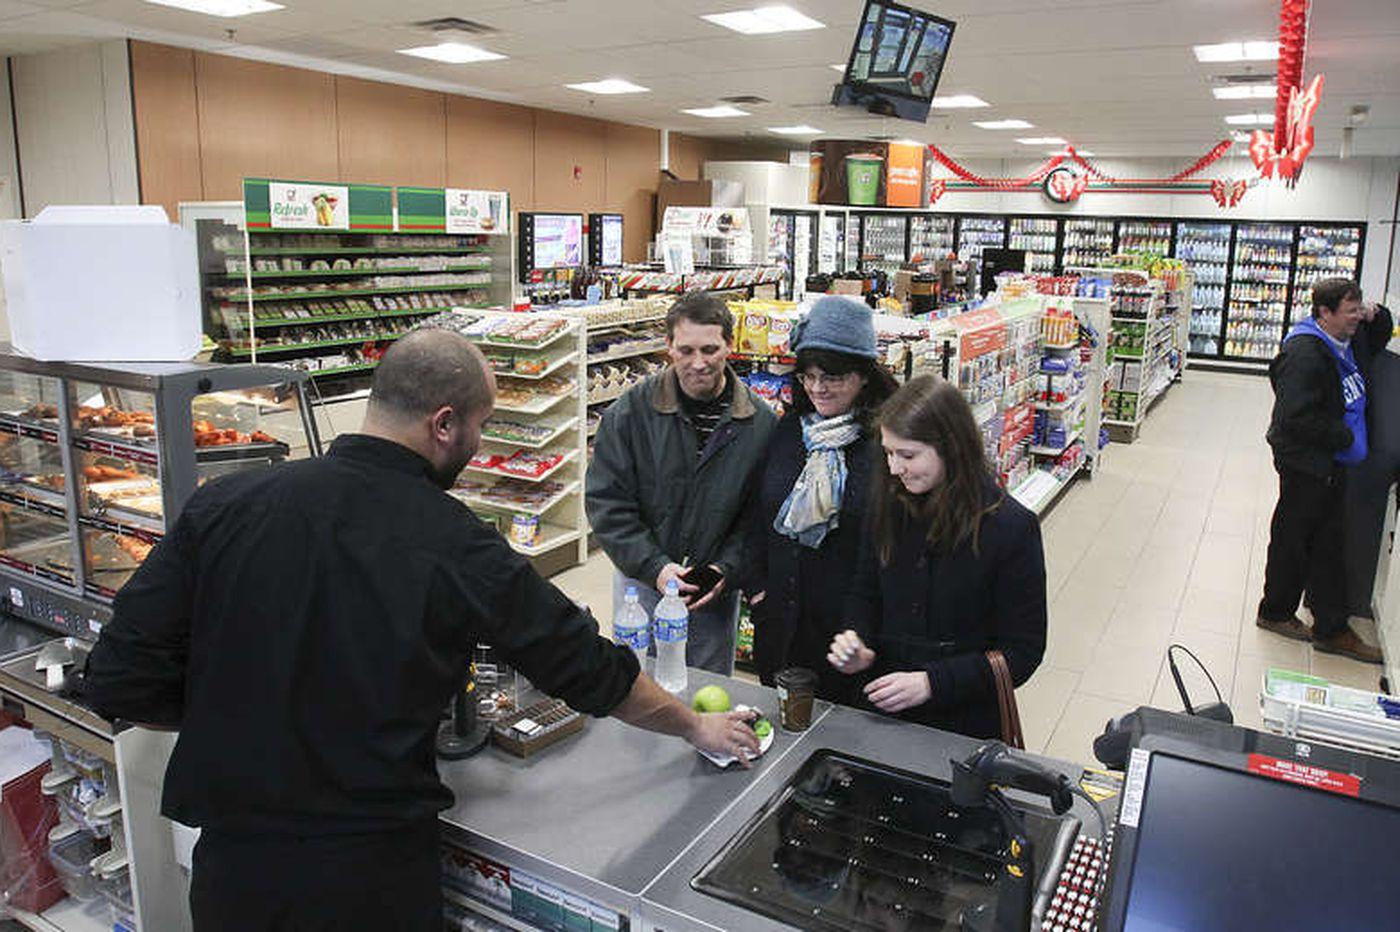 7-Eleven cultivating city clientele